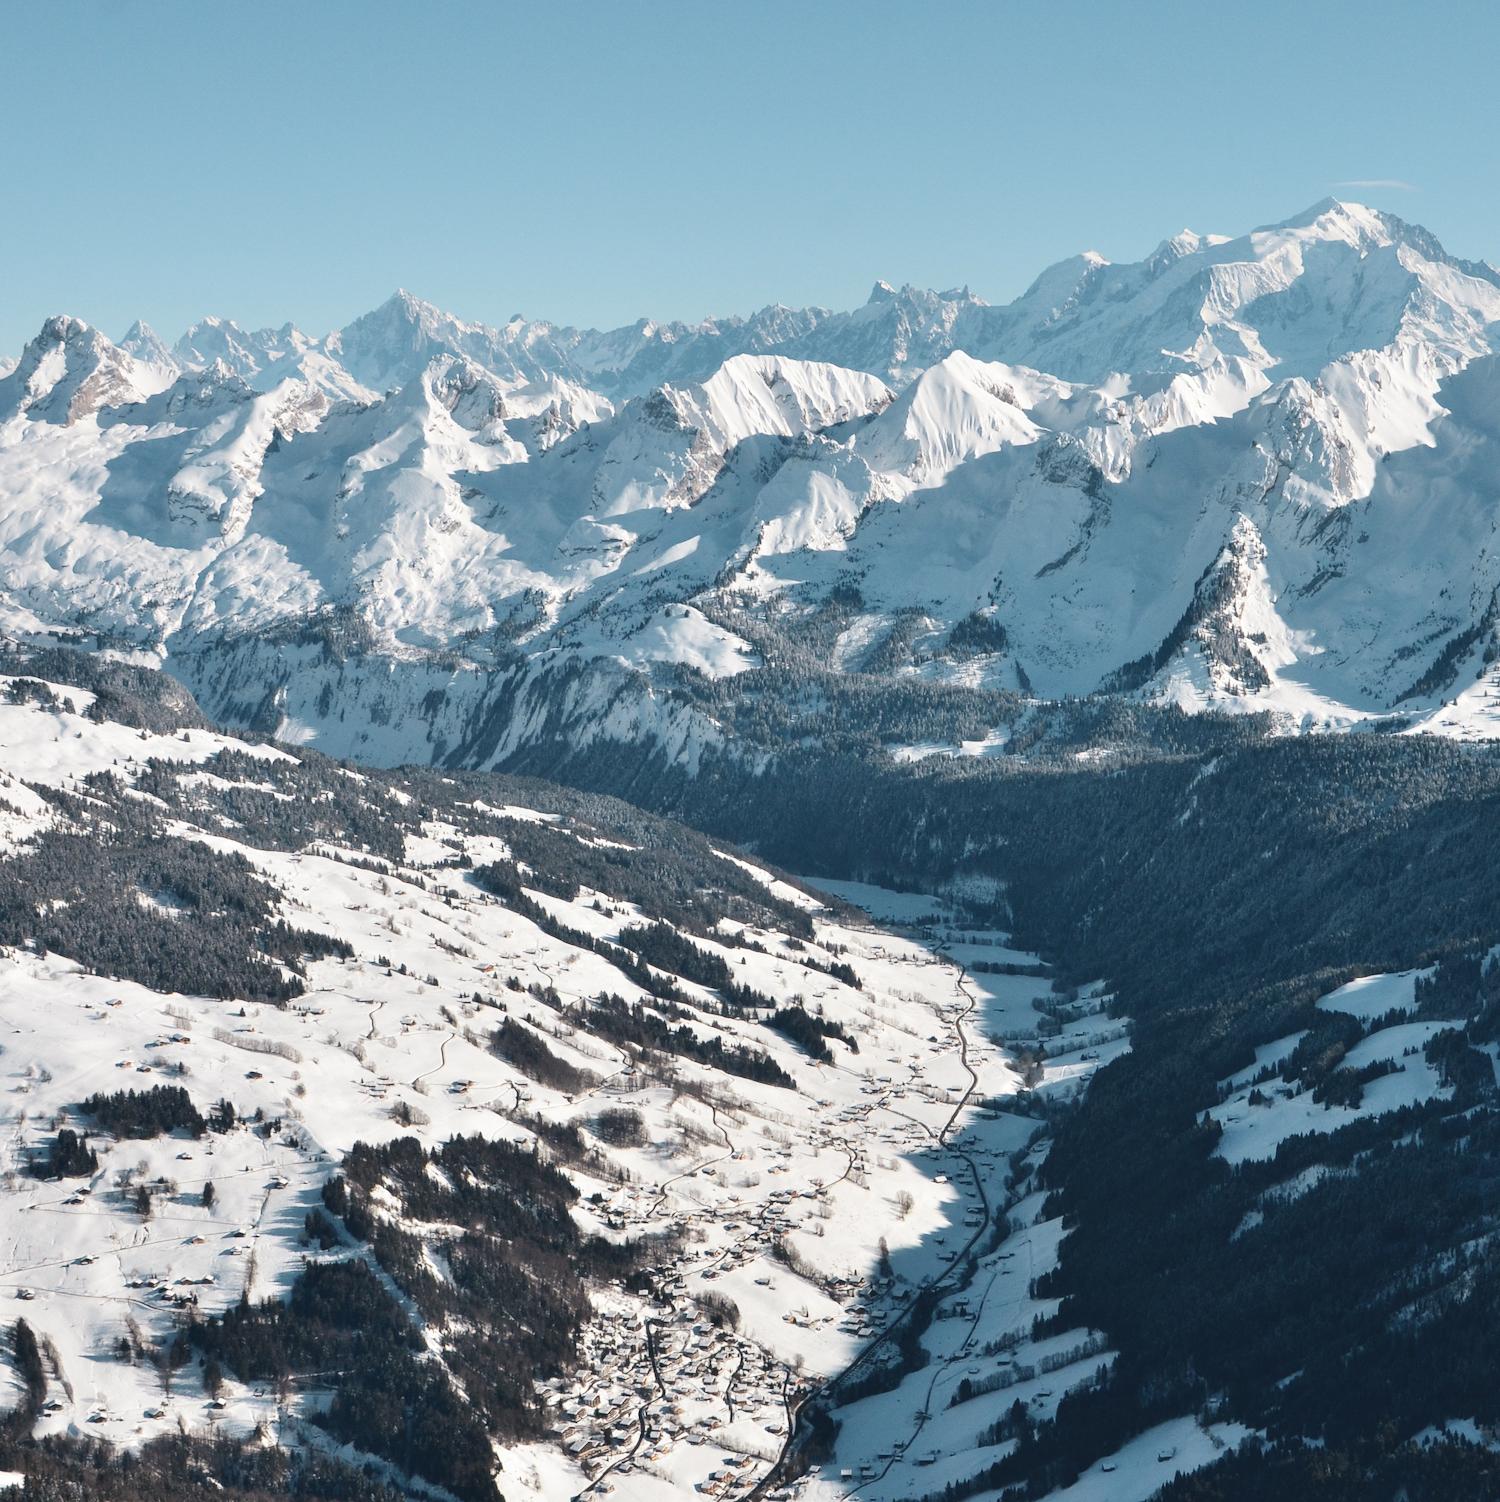 le grand bornand,grand bornand,vallee du bouchet,mont blanc - © © D. Machet